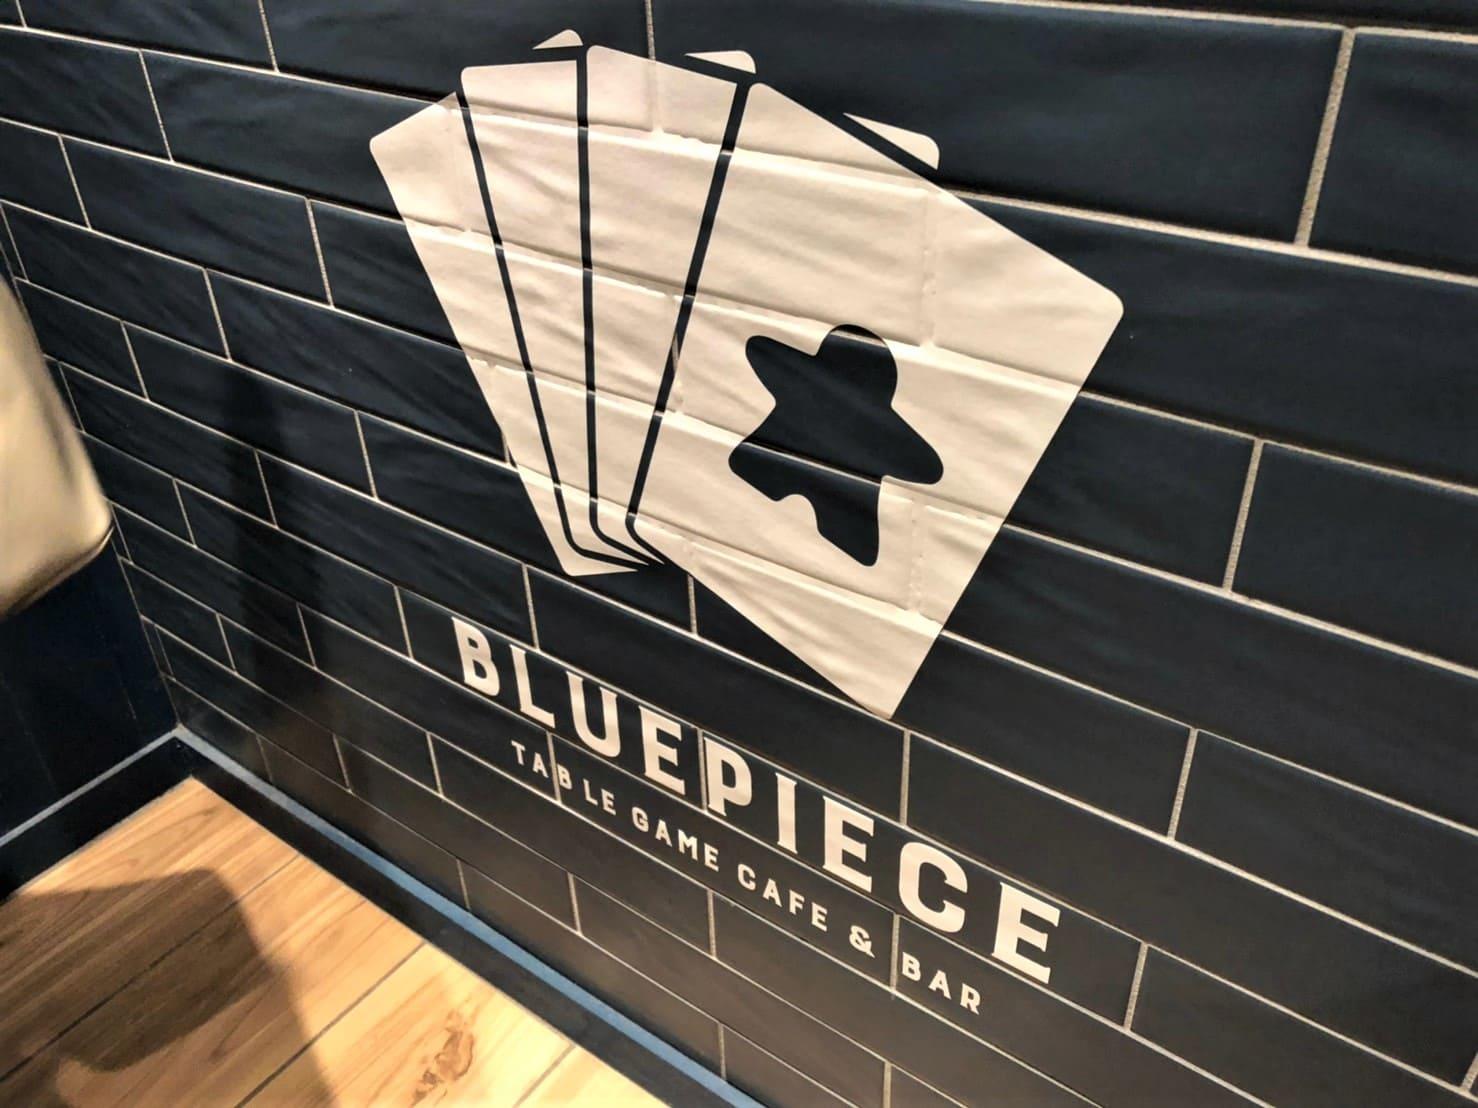 GameCafe&Bar BLUE PIECE(ブルーピース)のロゴ